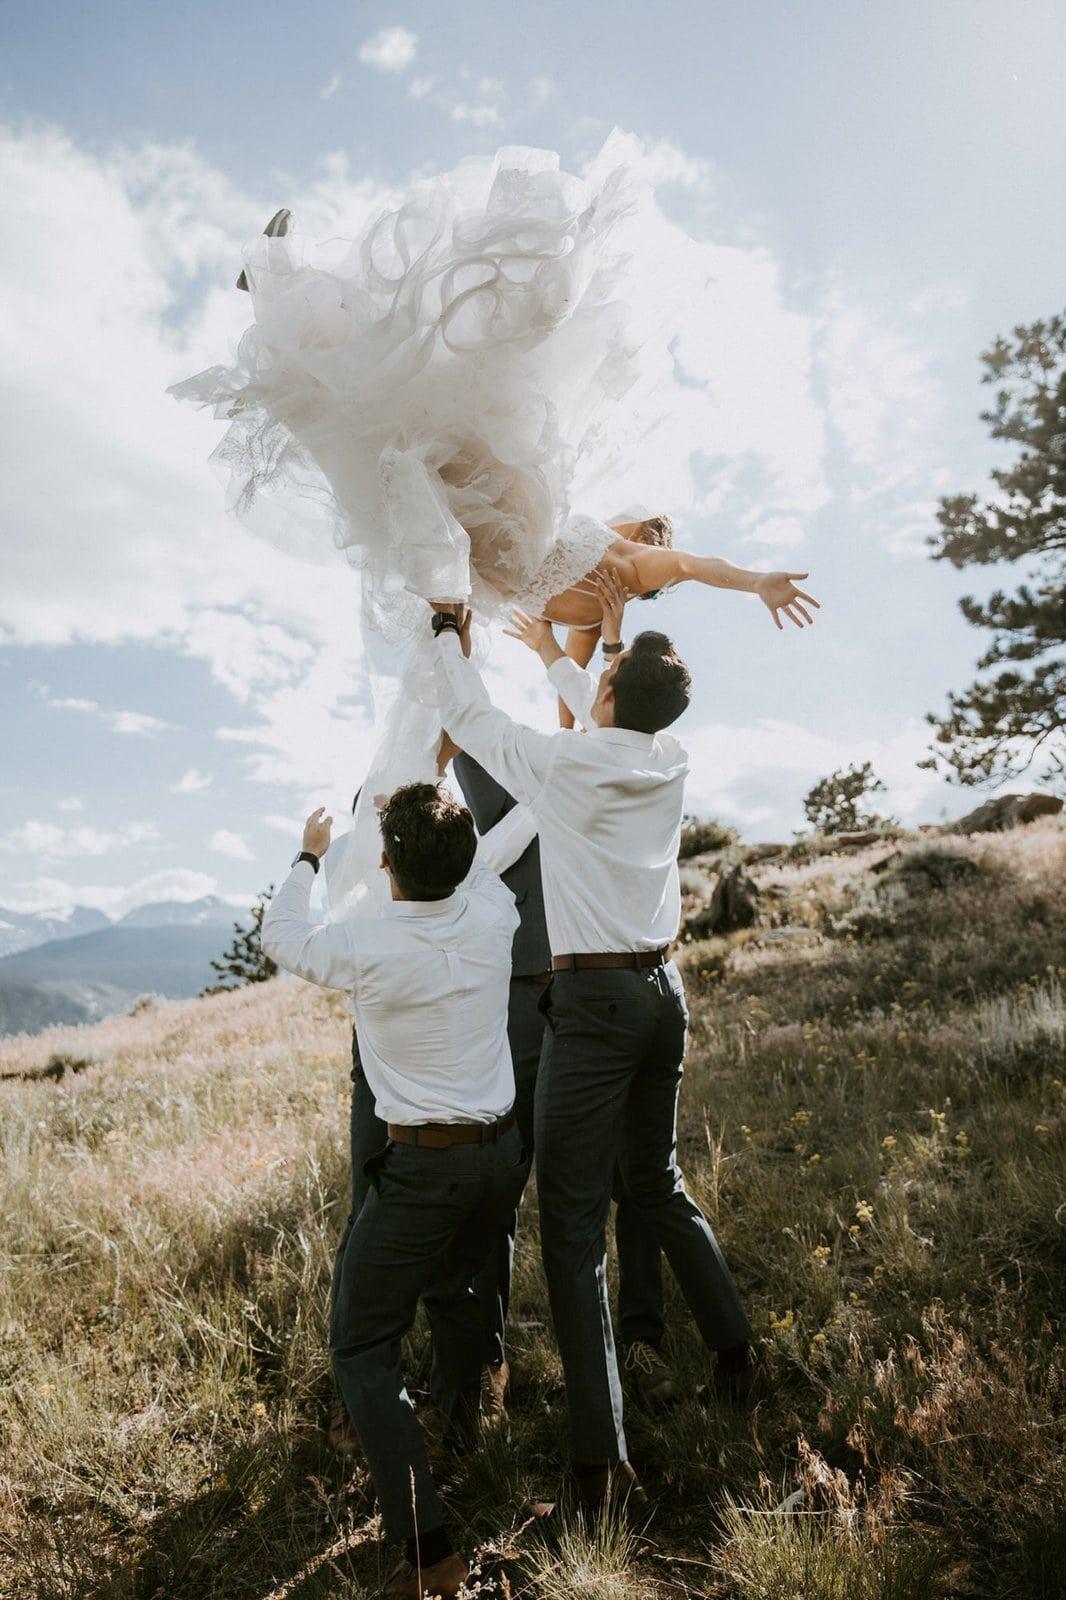 Groomsman throw up bride.